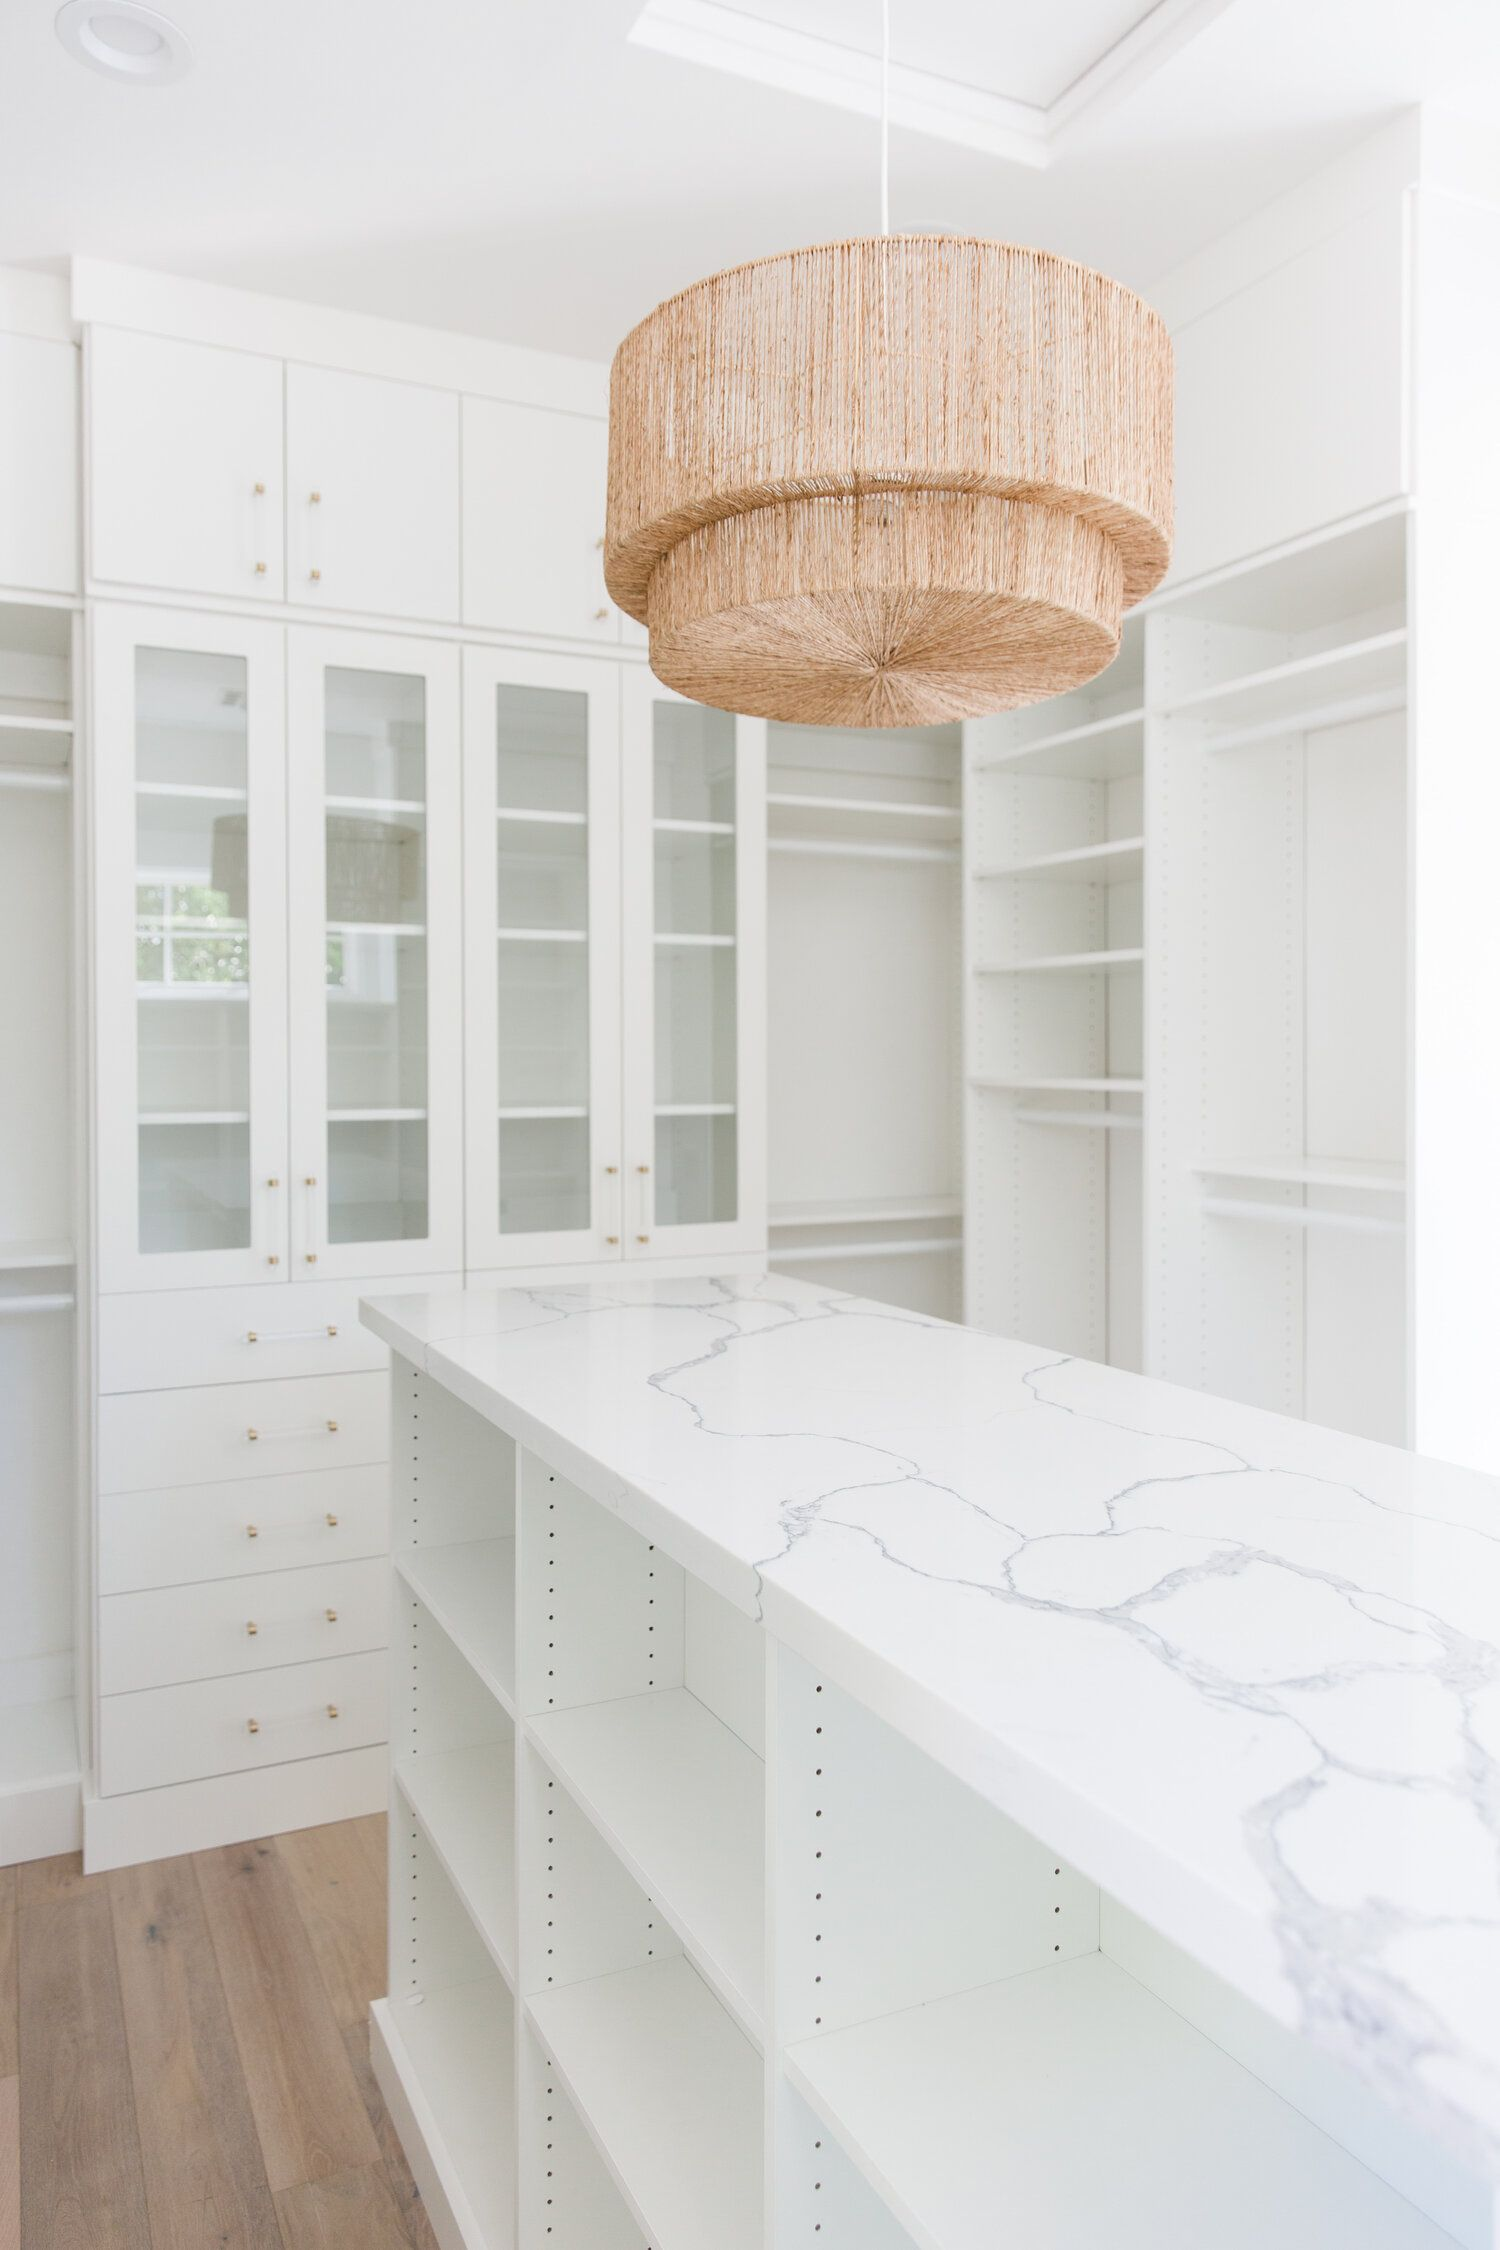 Stunning Master Closet Built Ins With Marble Countertops In 2020 Master Closet Design Master Bedroom Lighting Closet Built Ins